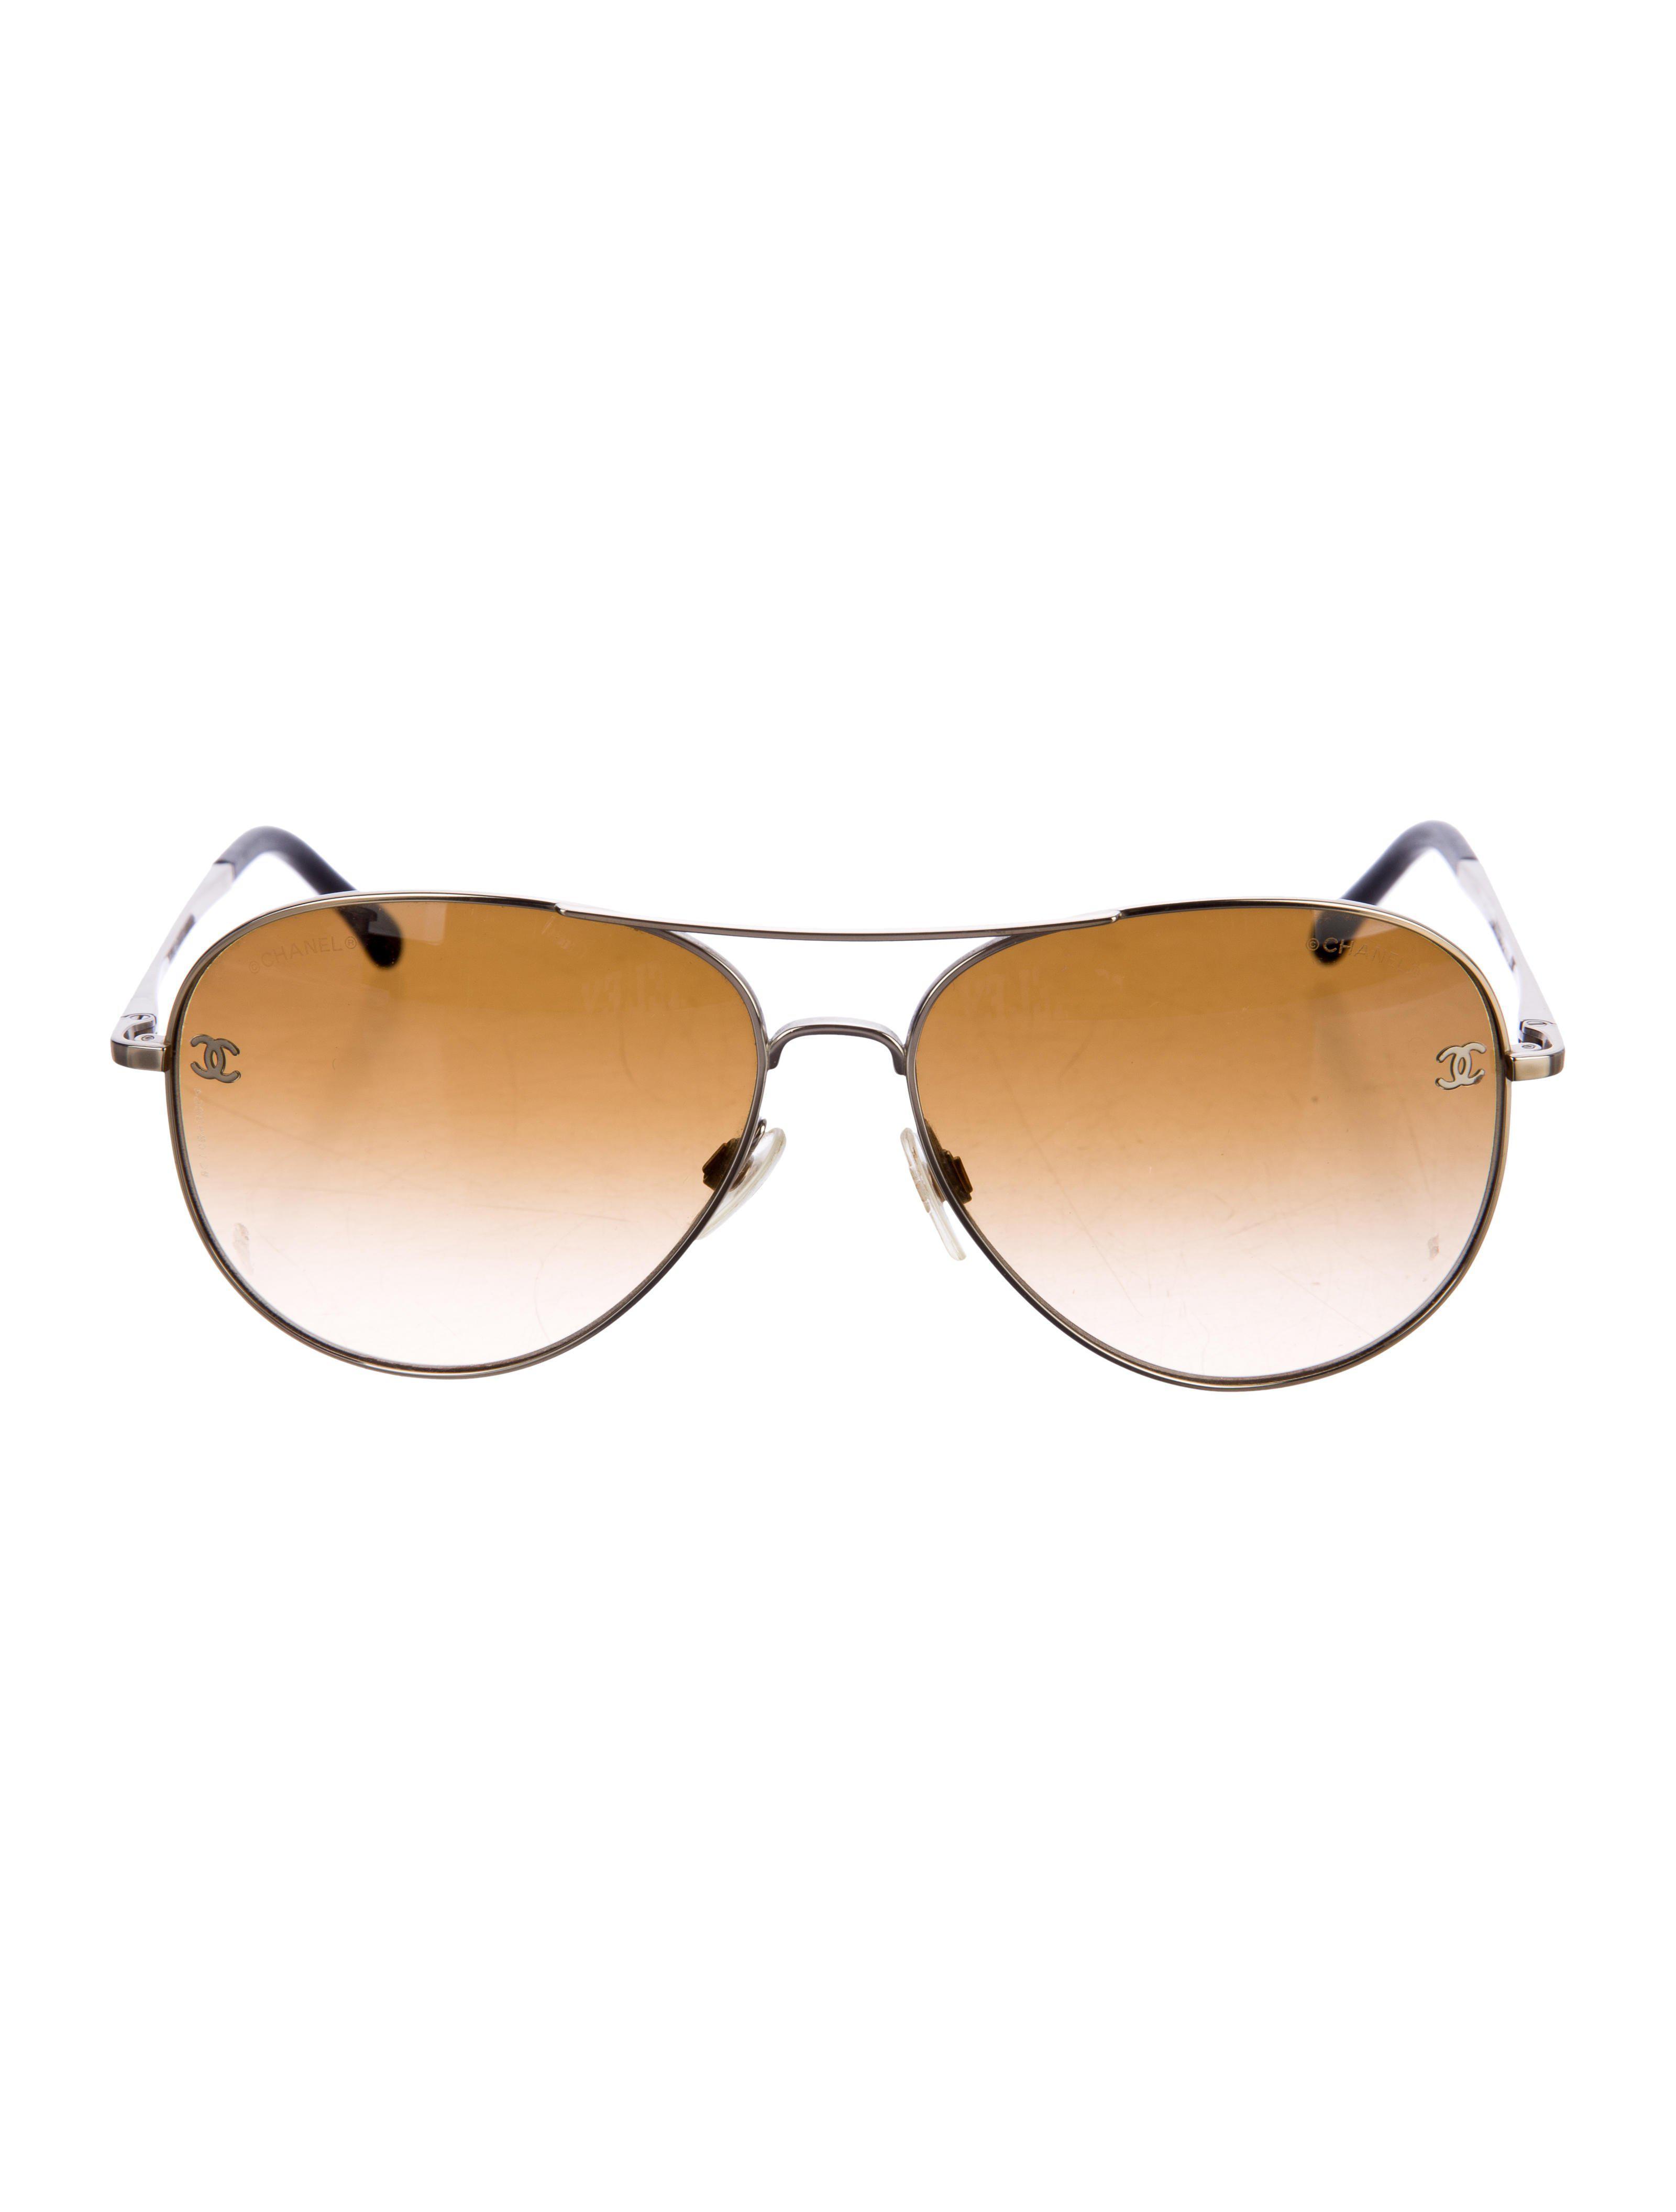 9200df1cf69 Lyst - Chanel Cc Pilot Sunglasses Gold in Metallic